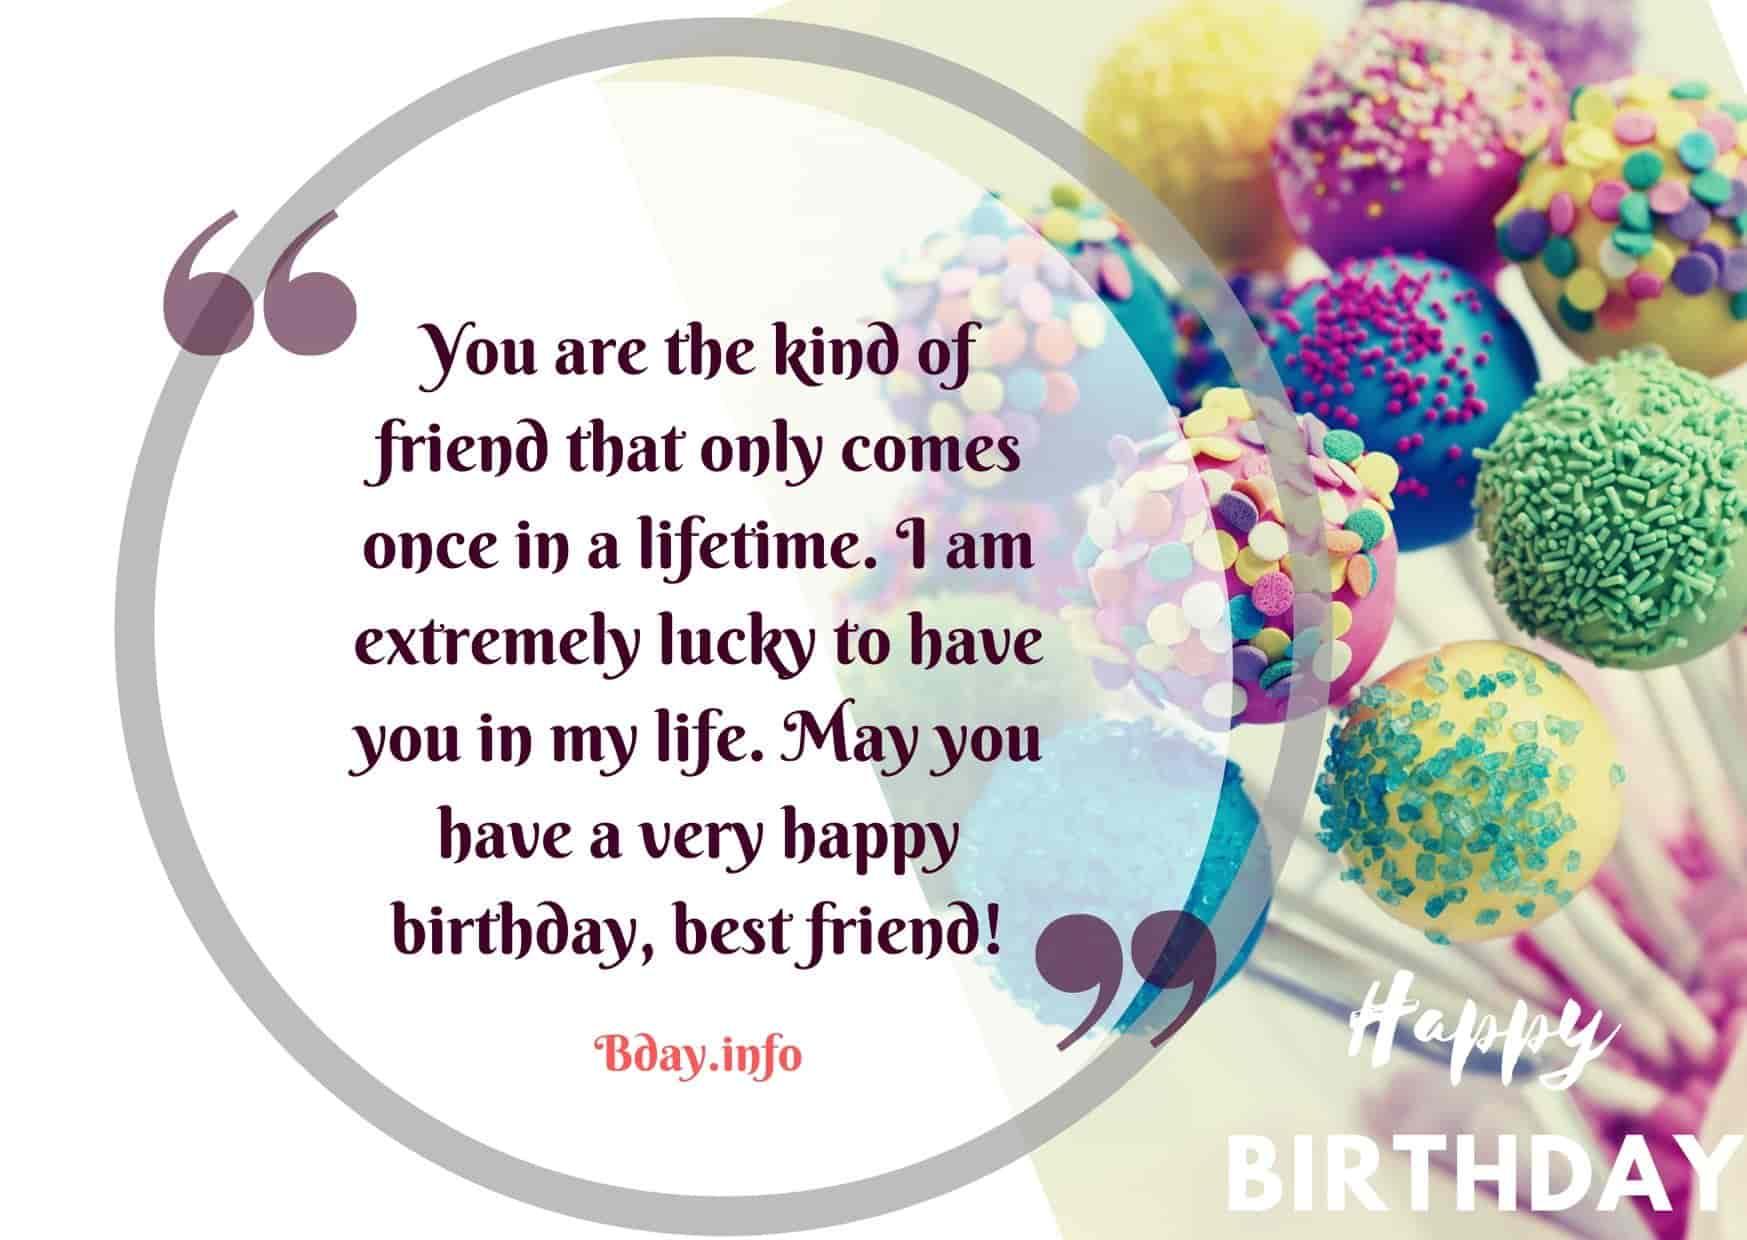 Birthday Wishes For Bestie Bday Info